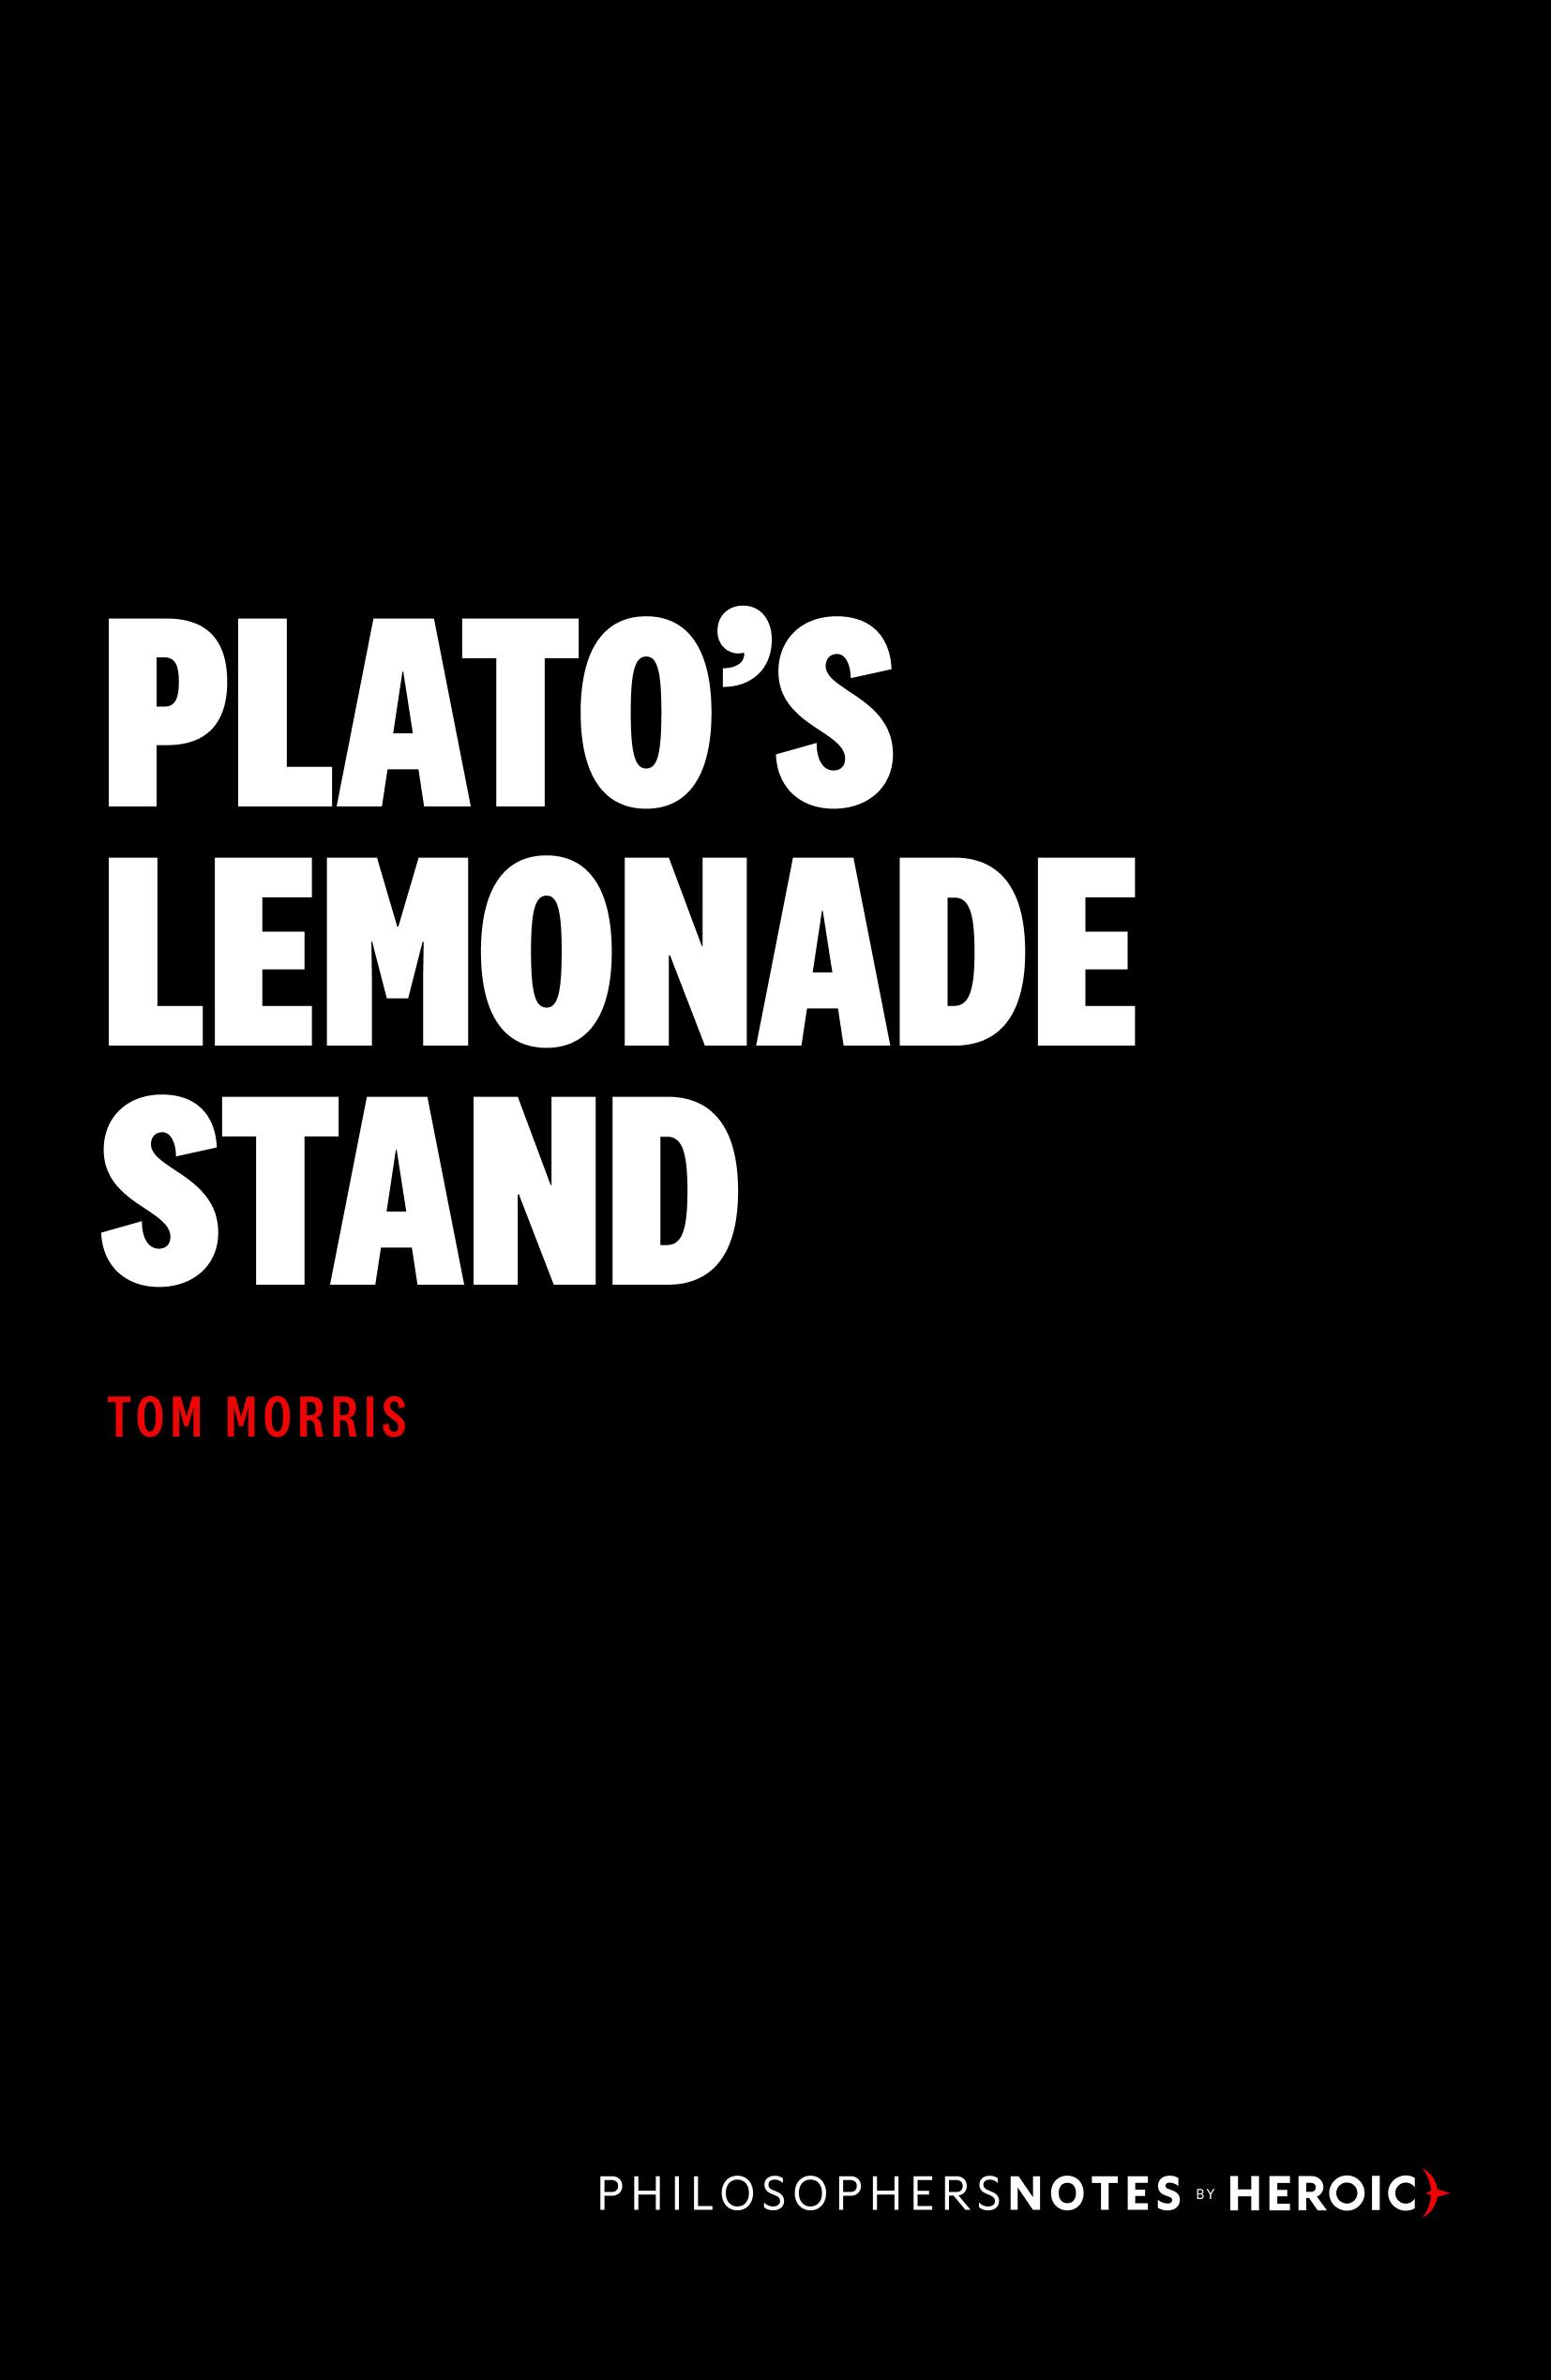 Plato's Lemonade Stand